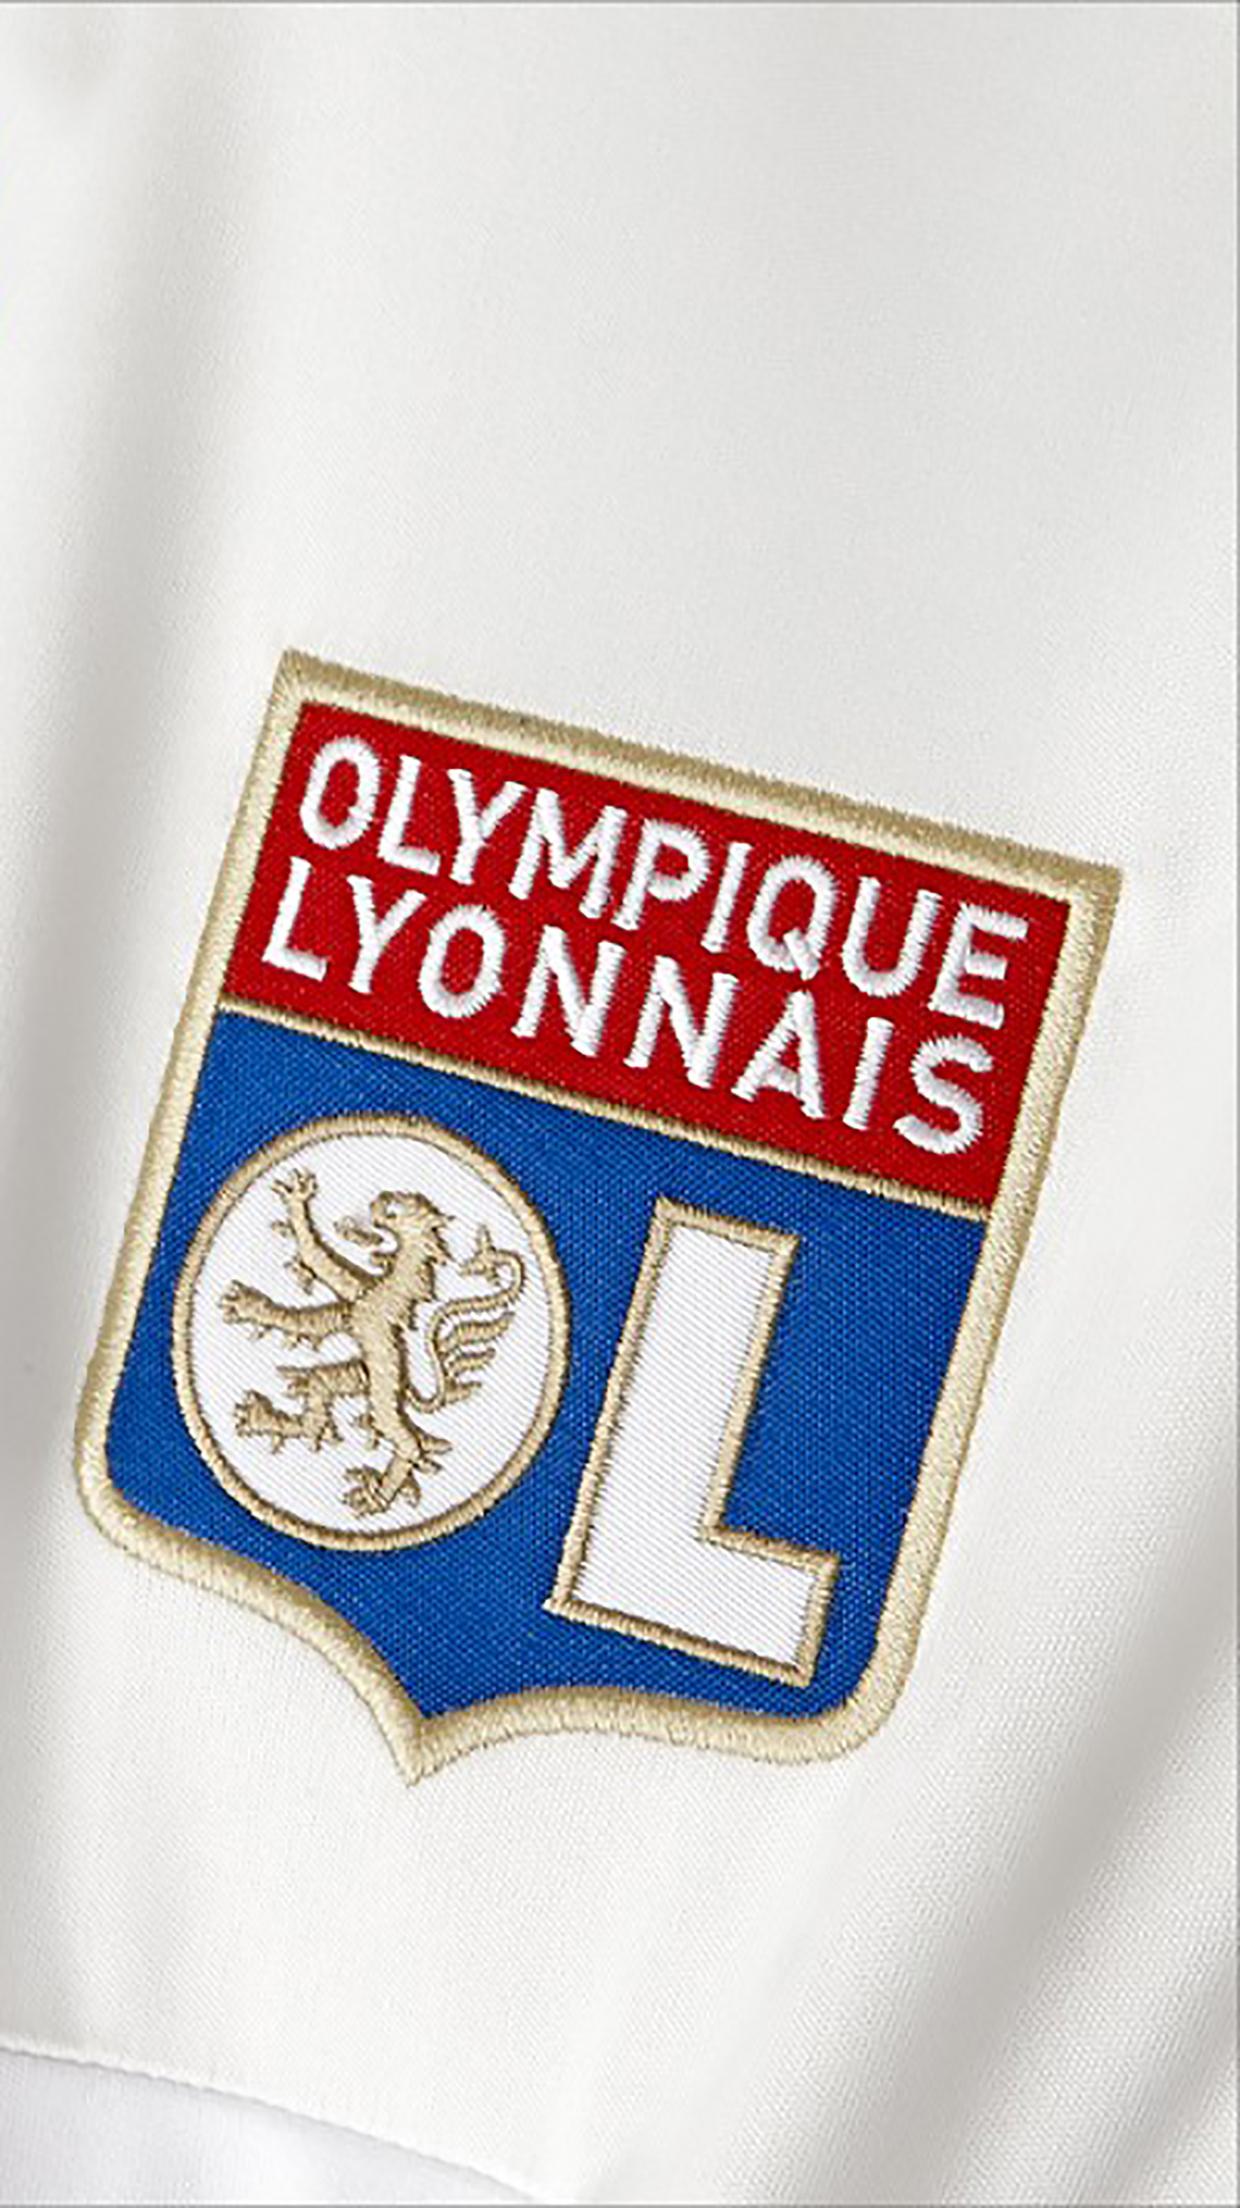 Olympique lyonnais logo 1 wallpaper for iphone x 8 7 - Logo olympique lyonnais ...